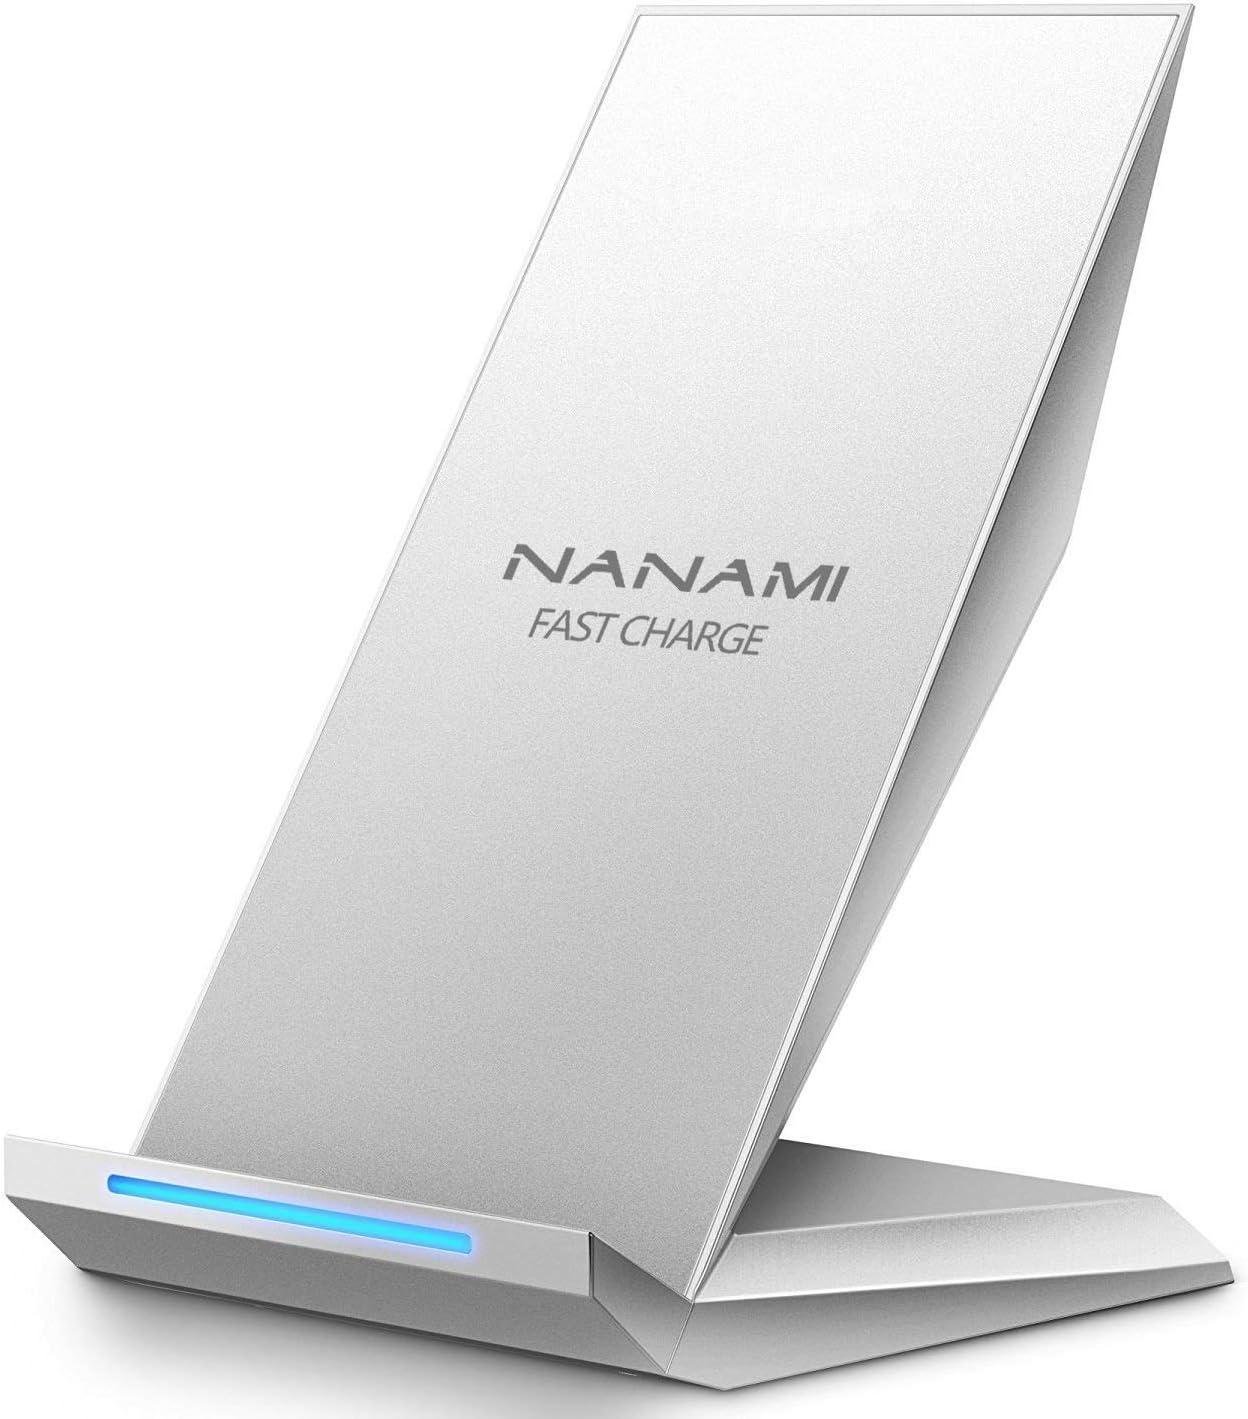 NANAMI Cargador Inalámbrico Rápido,Qi Inalámbrica Carga Rápida 10W y Estándar 7.5W para iPhone 11/11 Pro/XS/XS MAX/XR/X/8 Plus/8,Wireless Quick Charger para Samsung Galaxy S20 S10 S9 S8 S8 Plus Note10